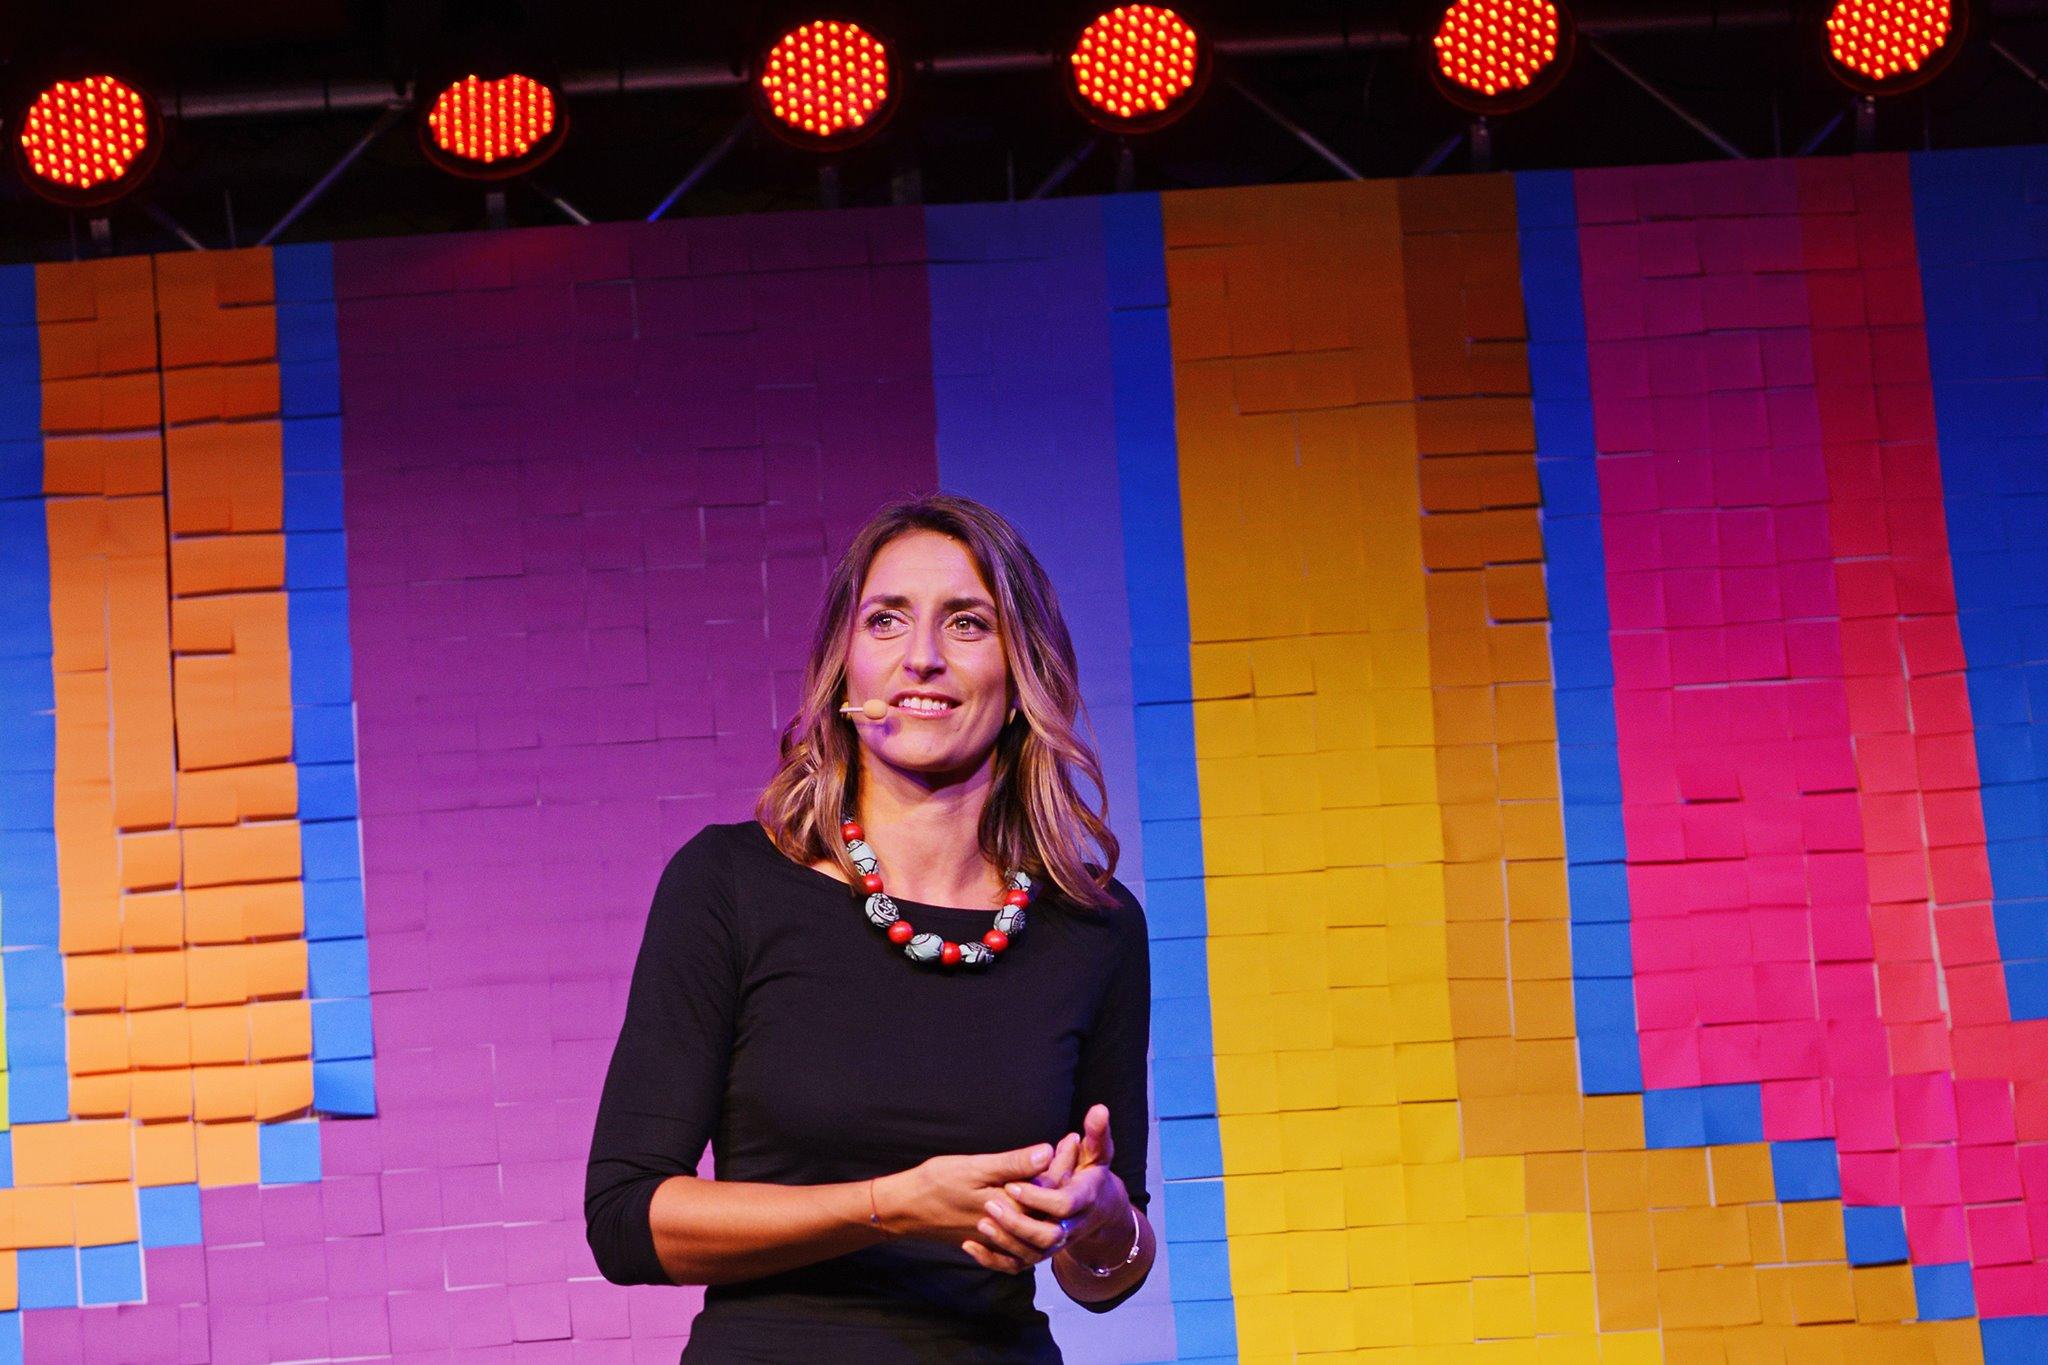 Martina Ressmüller